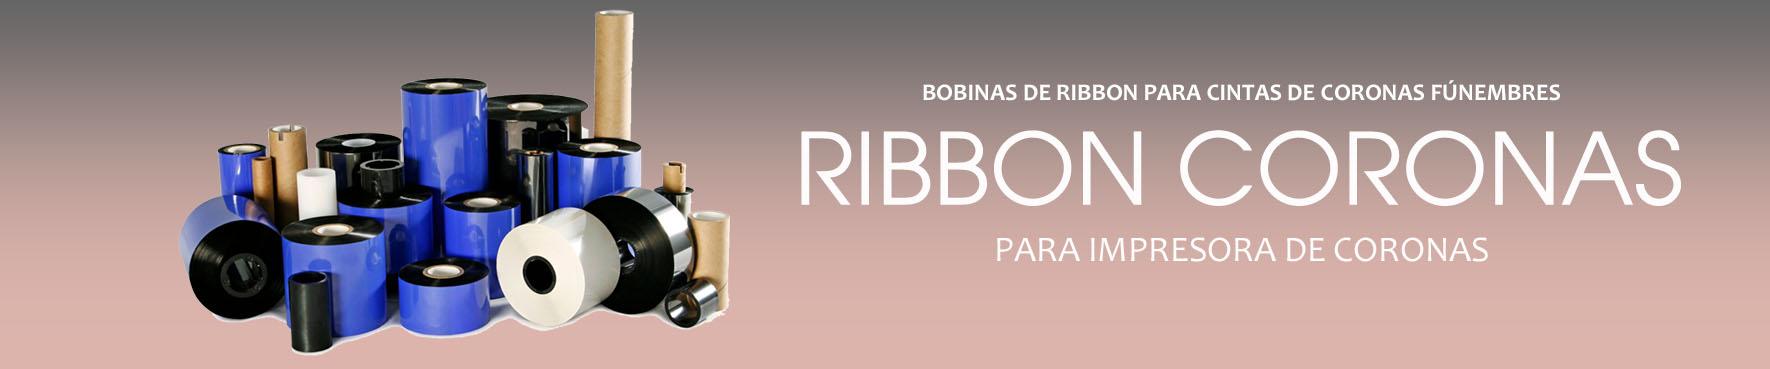 ribbon-coronas-funeraria